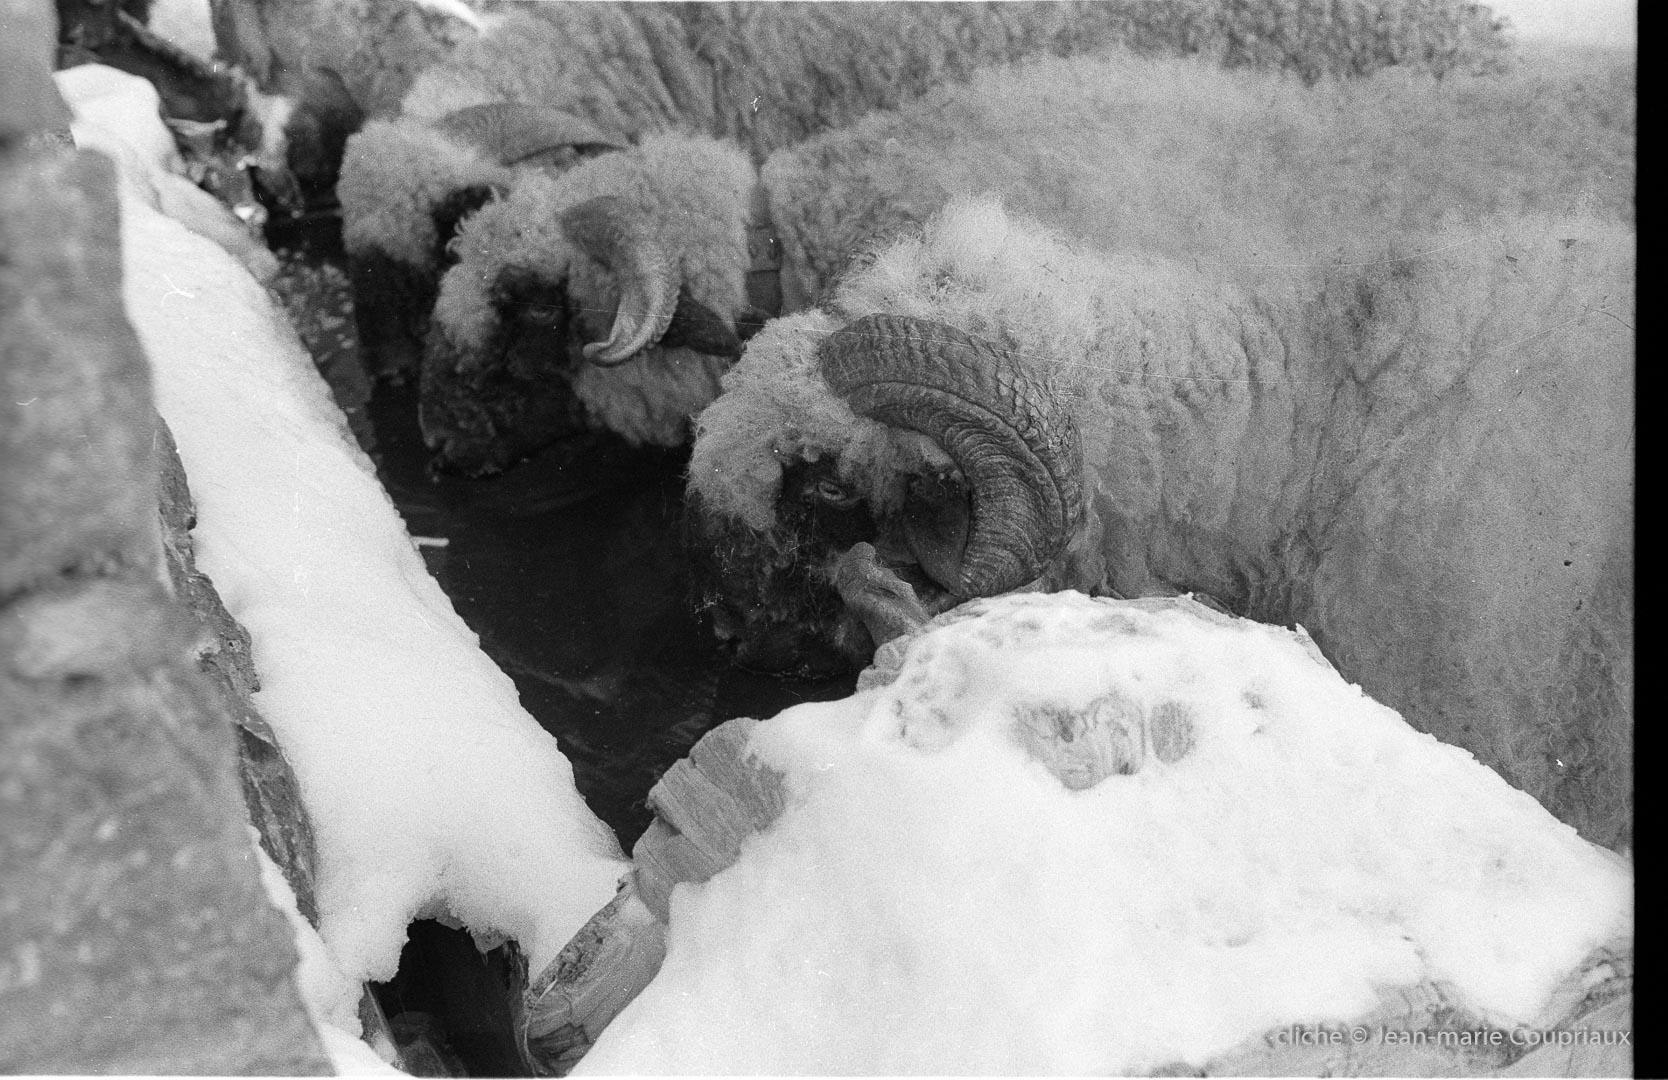 1978_Zermatt-nb-5.jpg